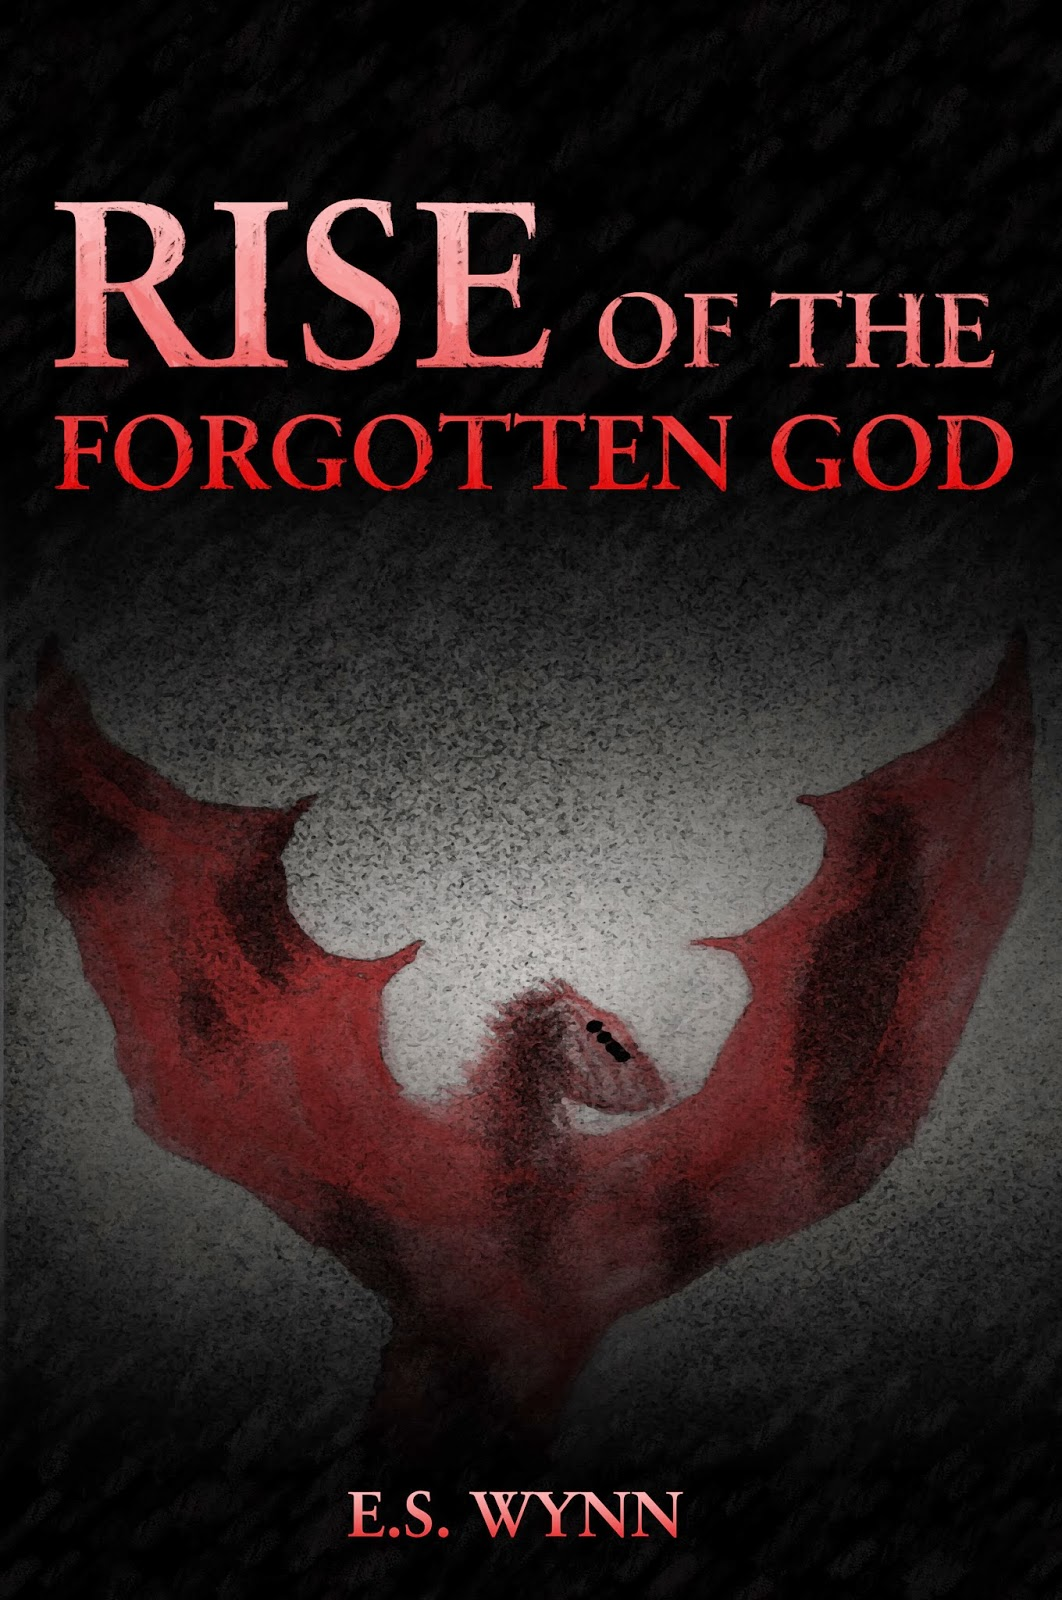 Rise of the Forgotten God